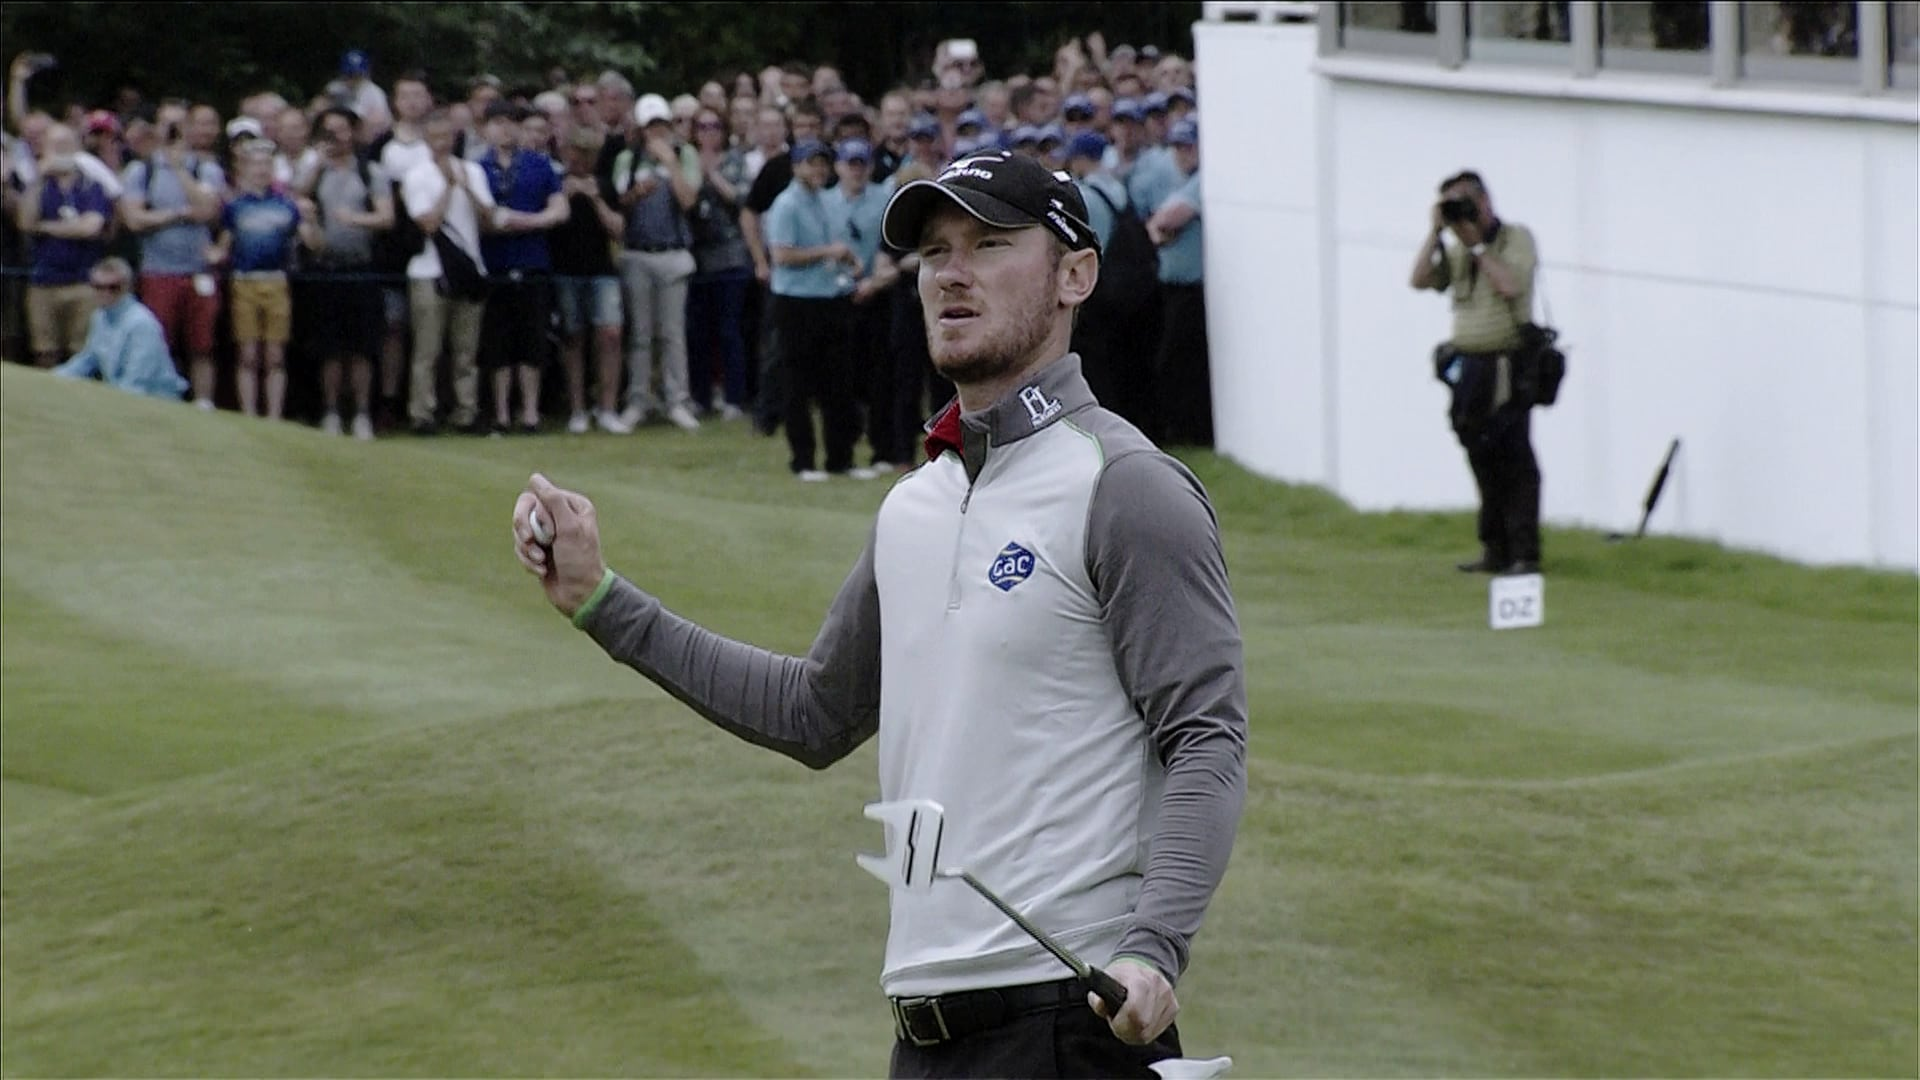 Chris Wood Looks Back On Bmw Pga Win At Wentworth Golf